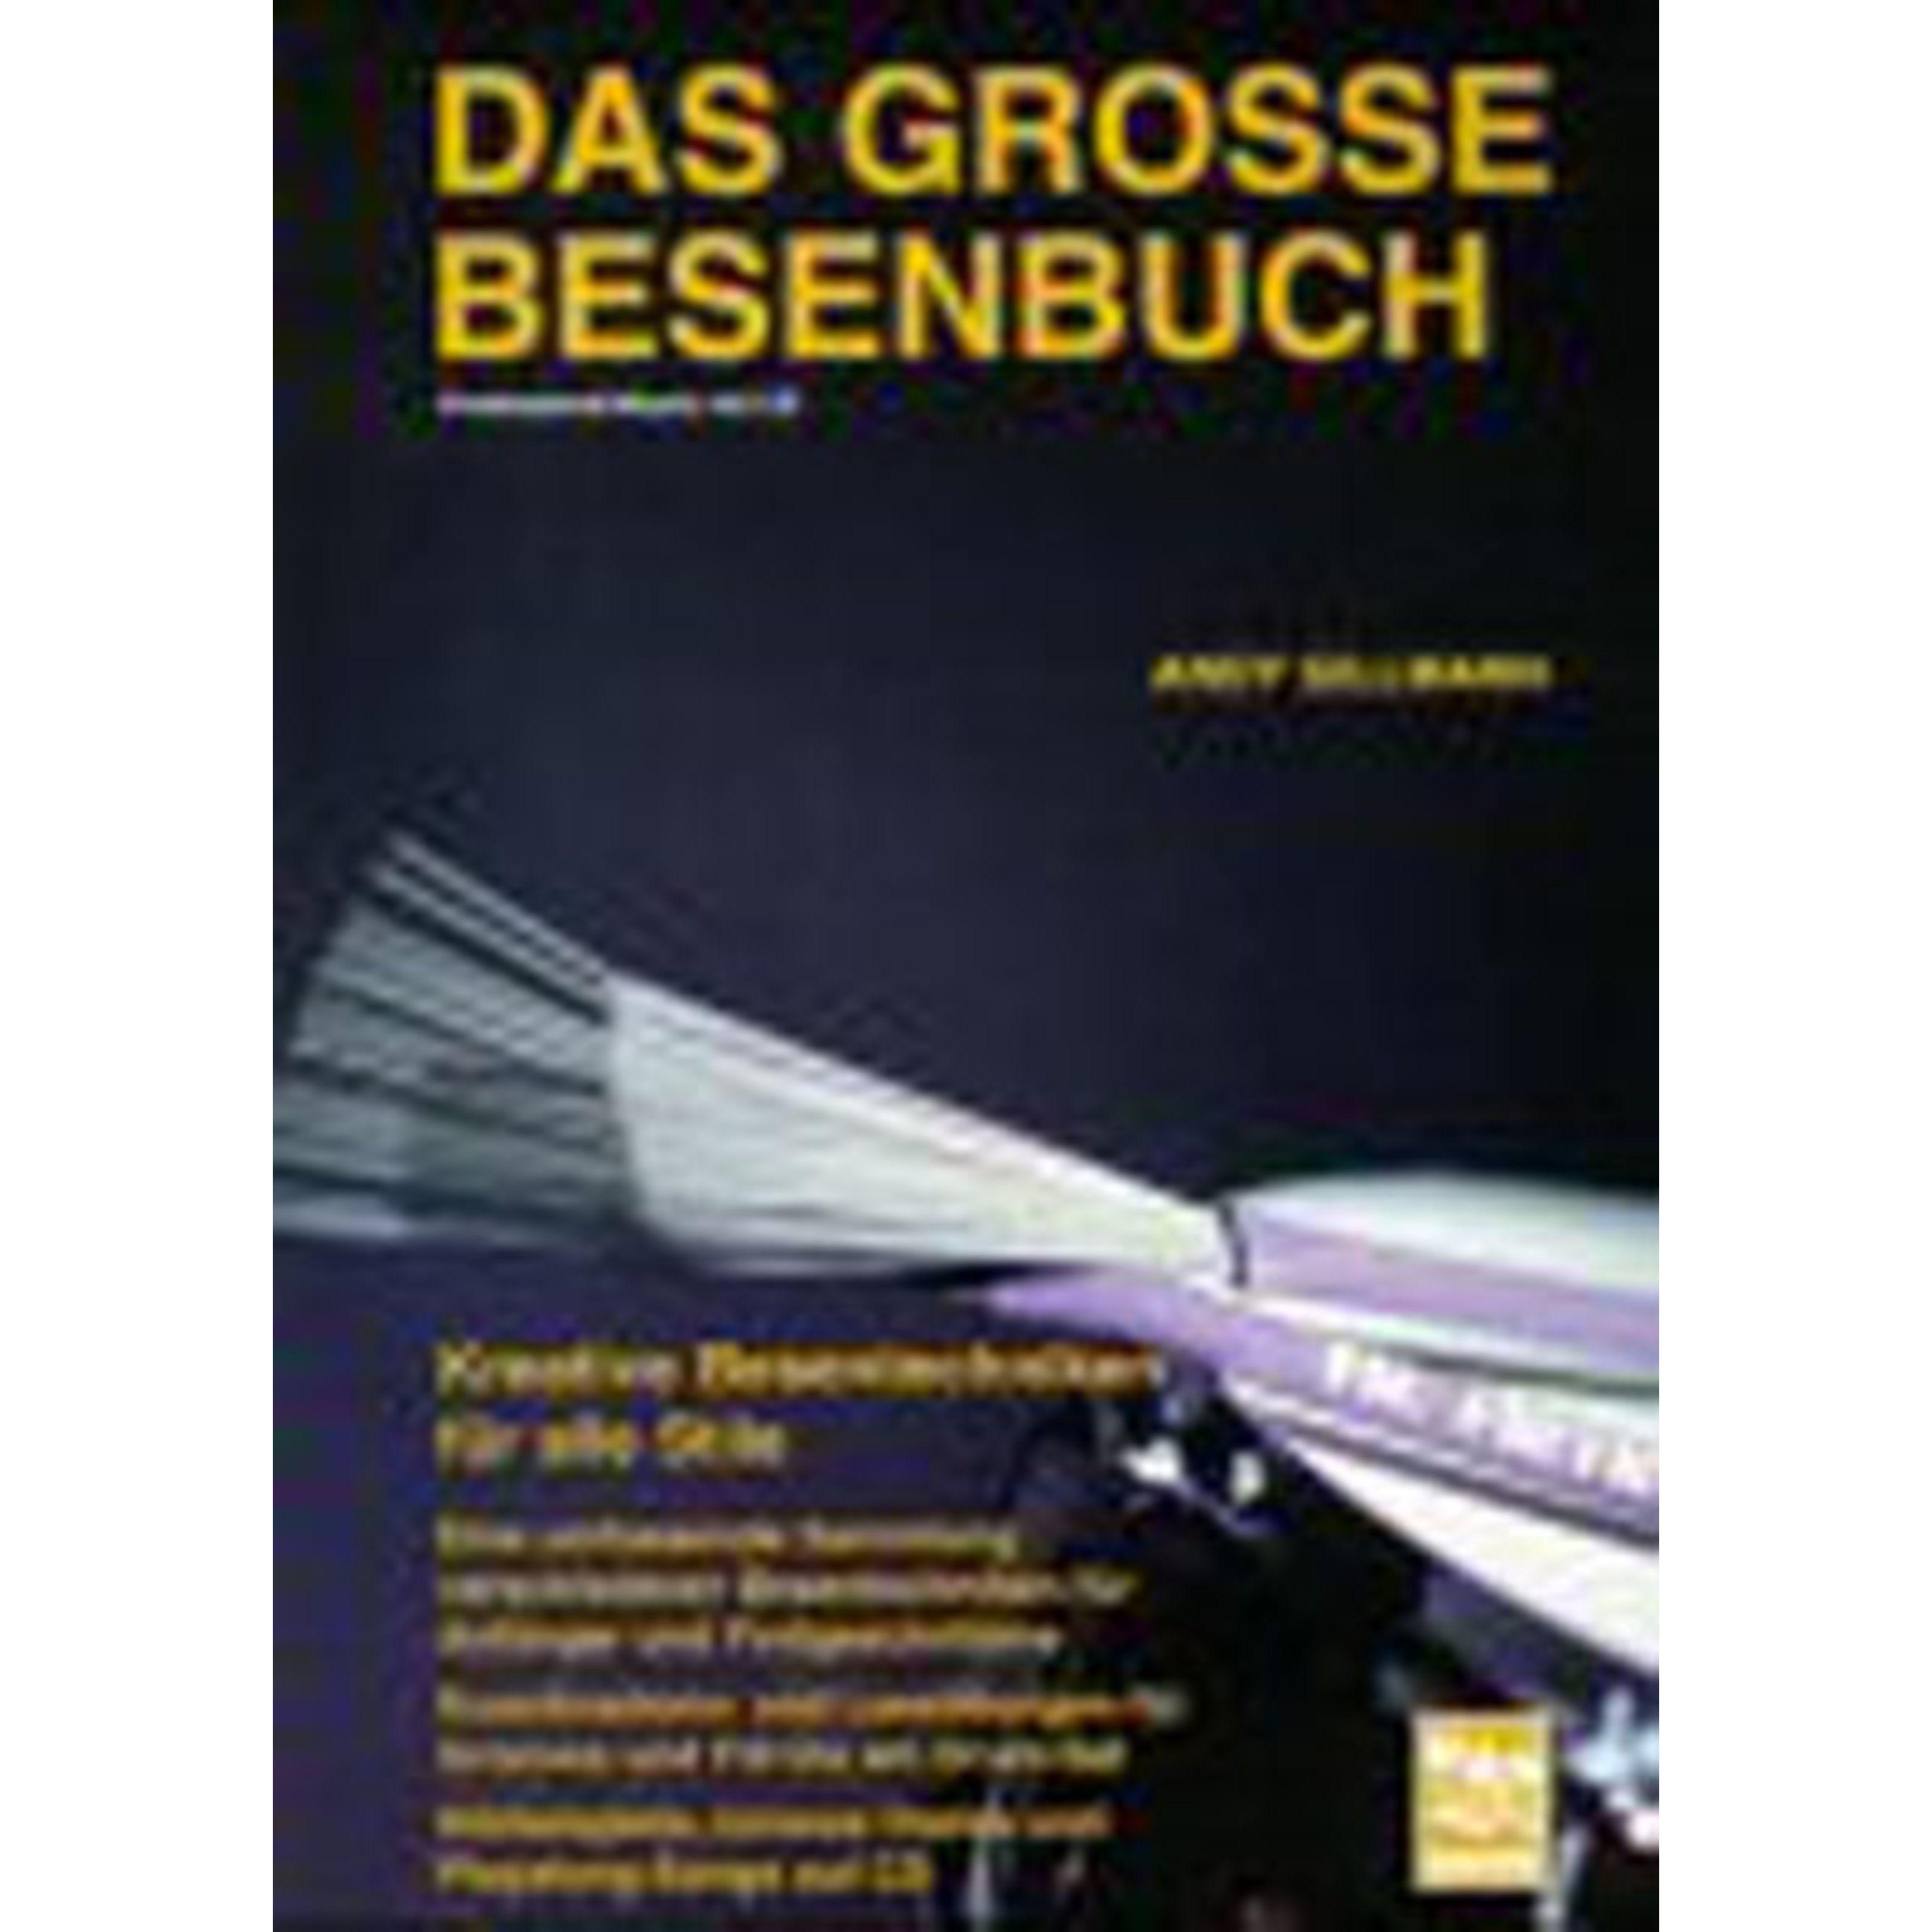 Leu-Verlag - Das grosse Besenbuch Andy Gillmann,inkl. CD 9783928825870